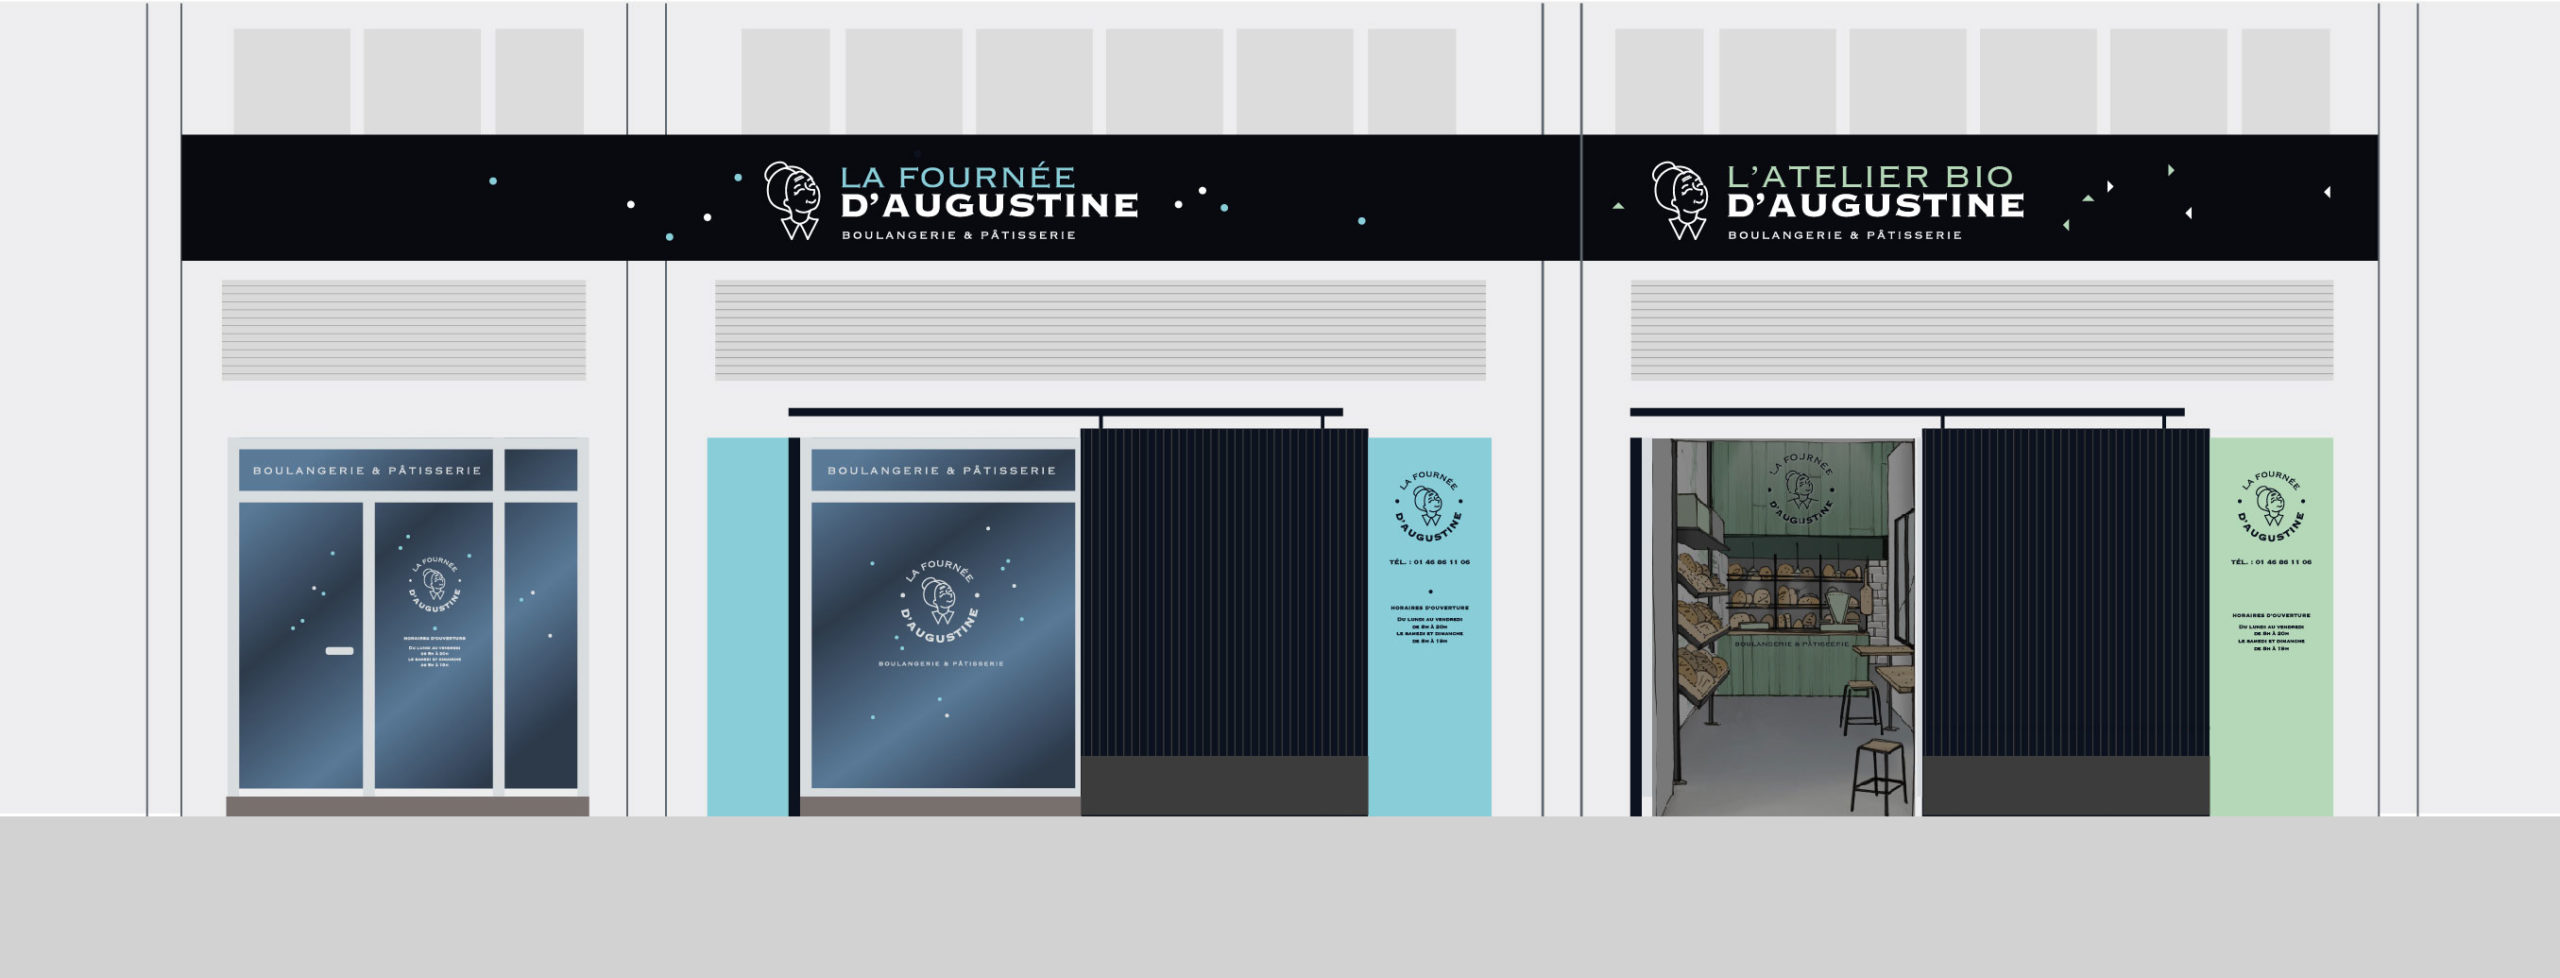 DAIAMSITE-FOURNEE-11